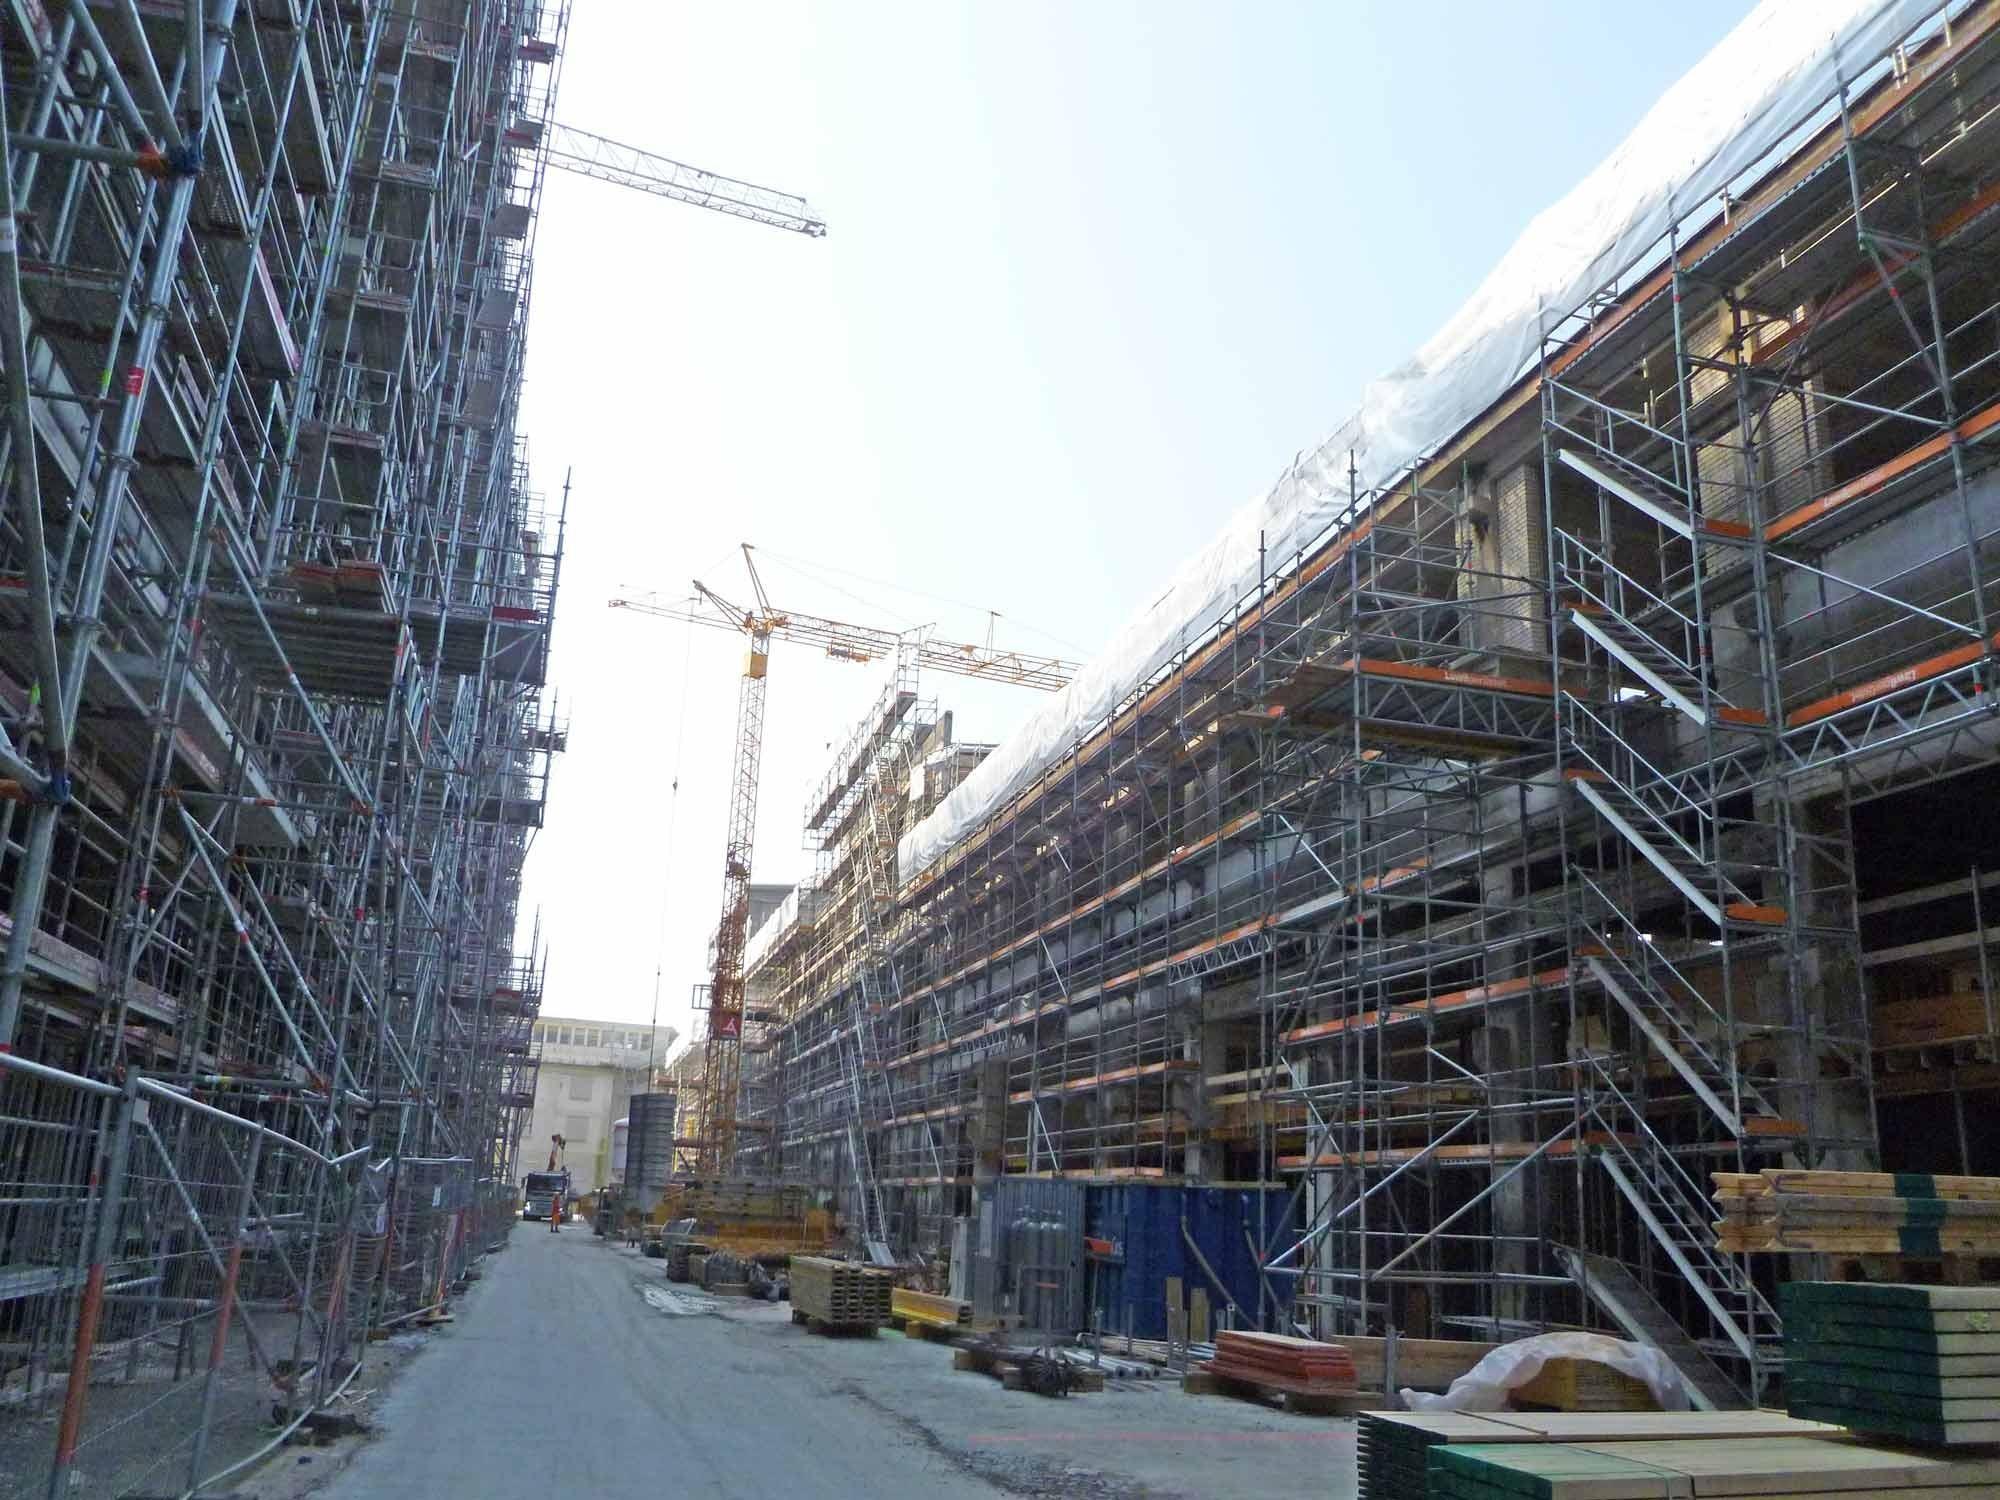 Baustelle auf Papieri-Areal in Cham